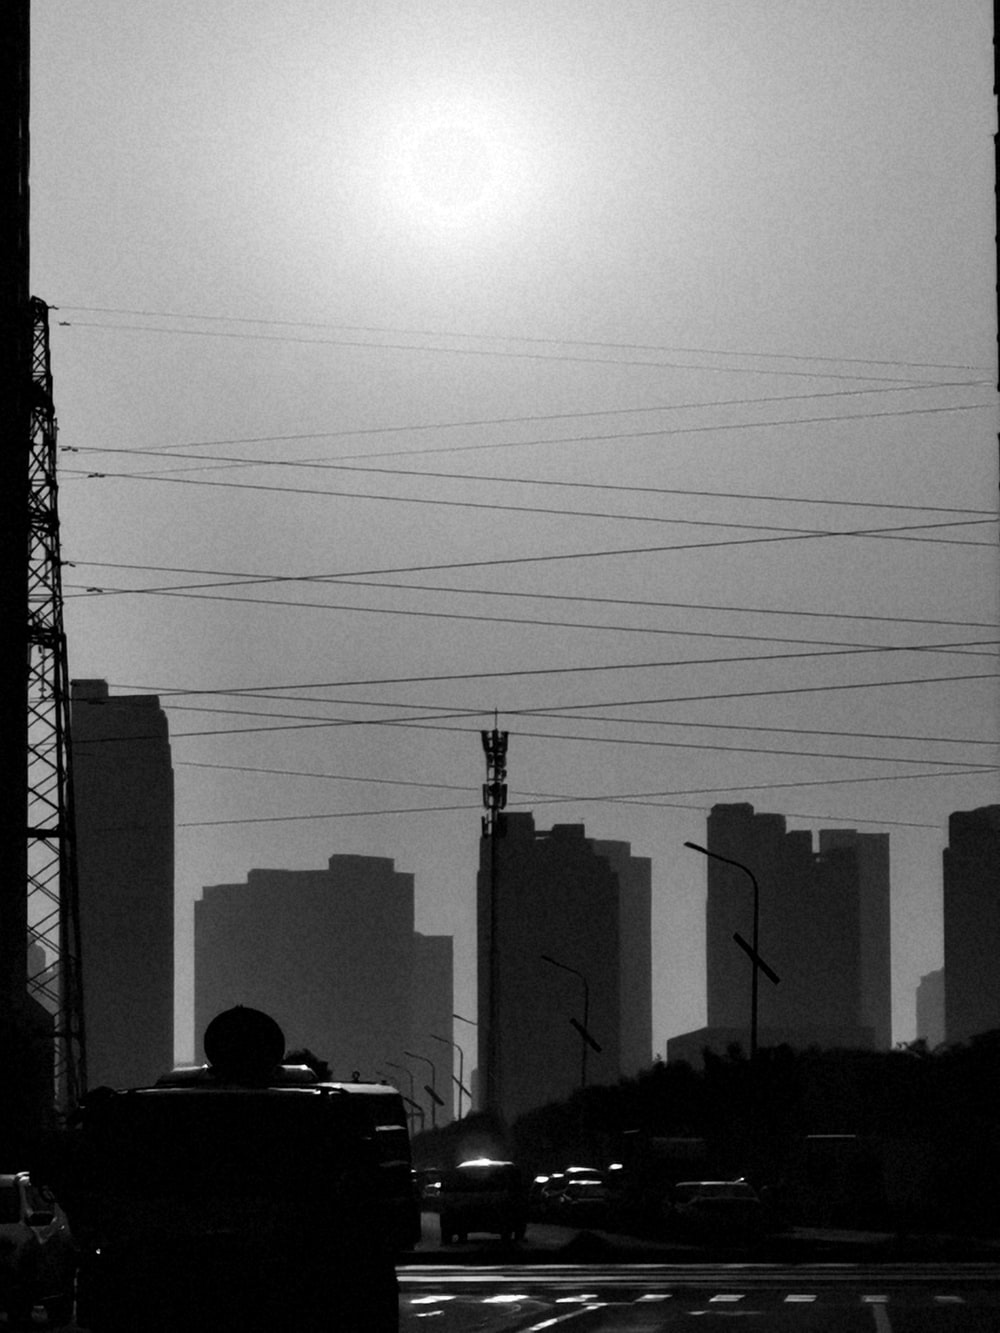 high-rise building under sun